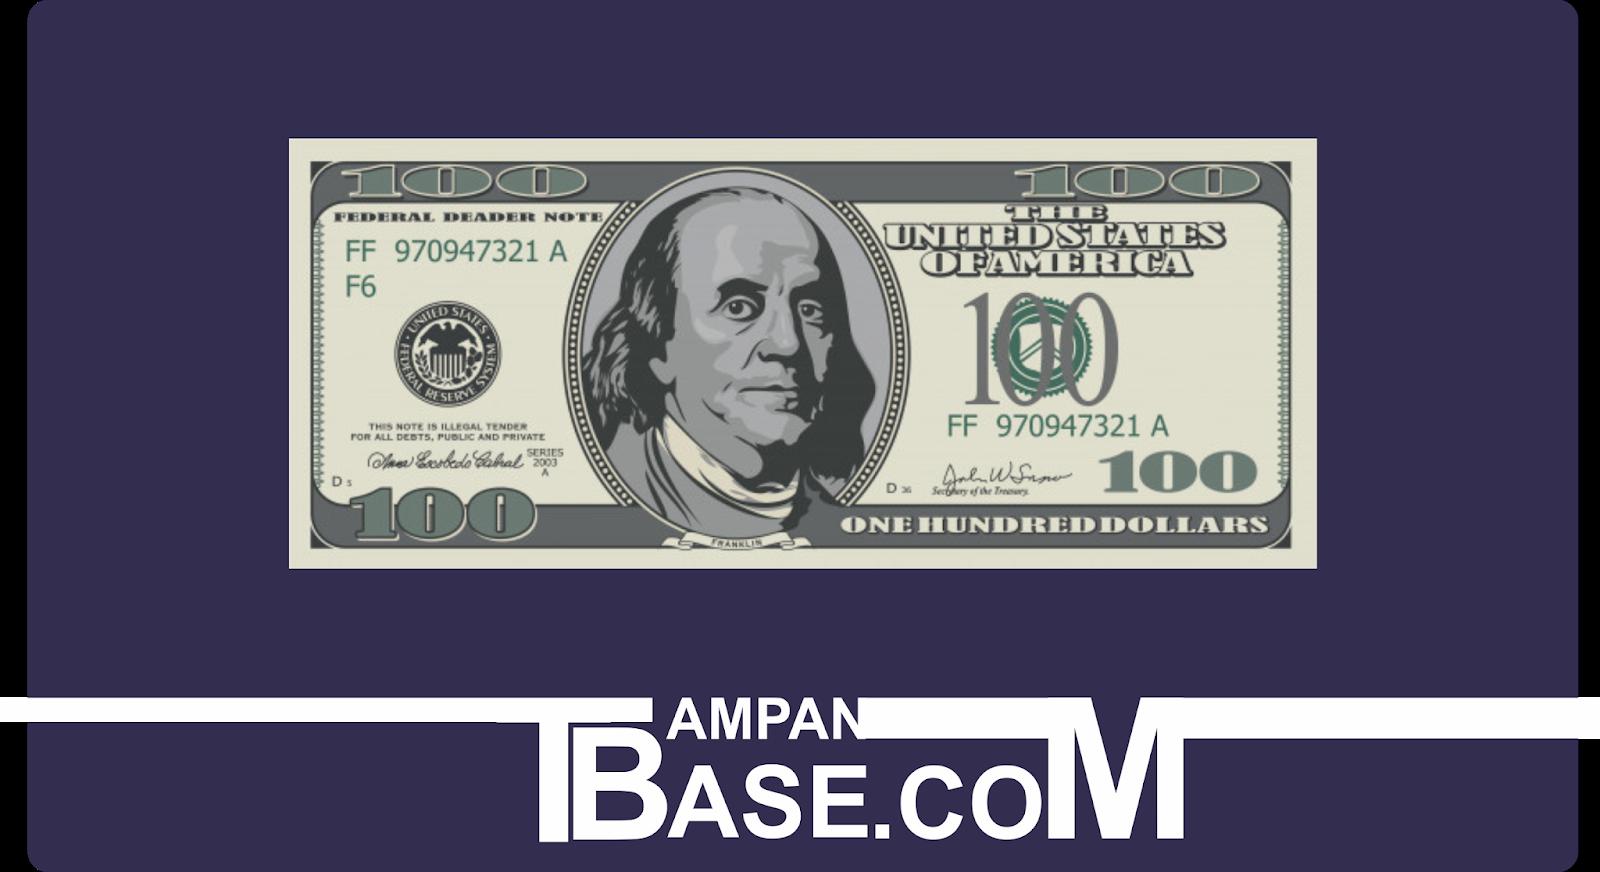 Cara Jitu Mendapatkan $100 Hanya Dengan 1 Artikel